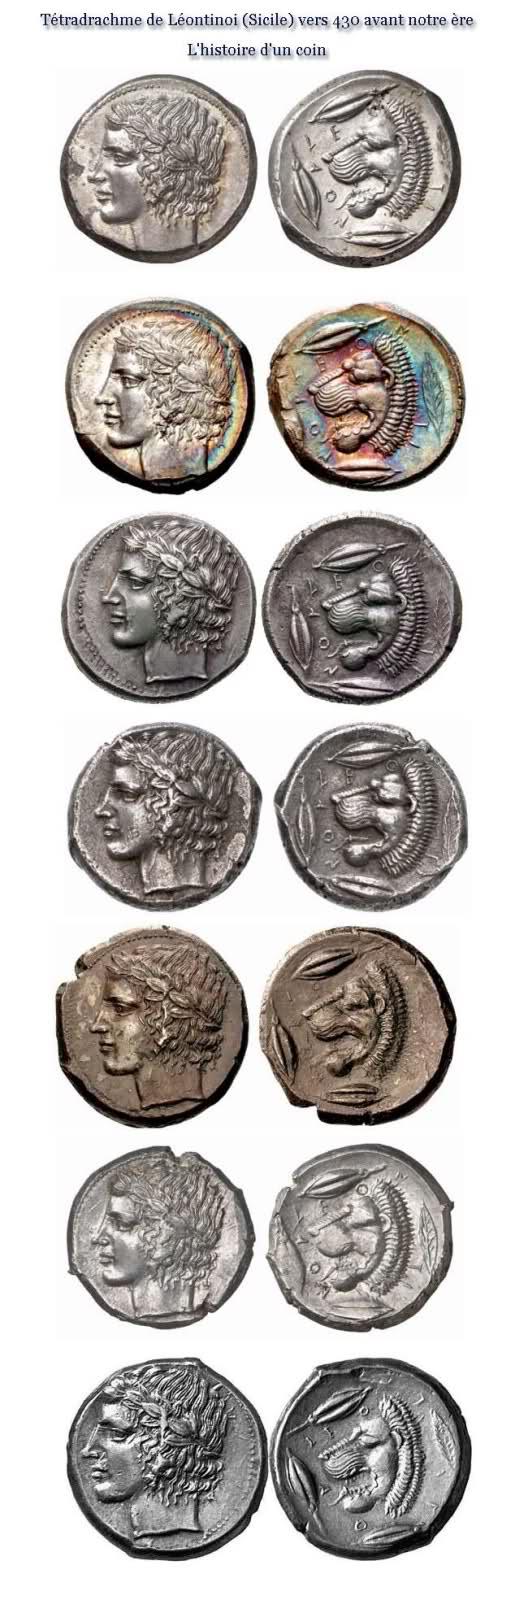 cassure de coin Tétradrachme de Léontinoi 2jaagbc